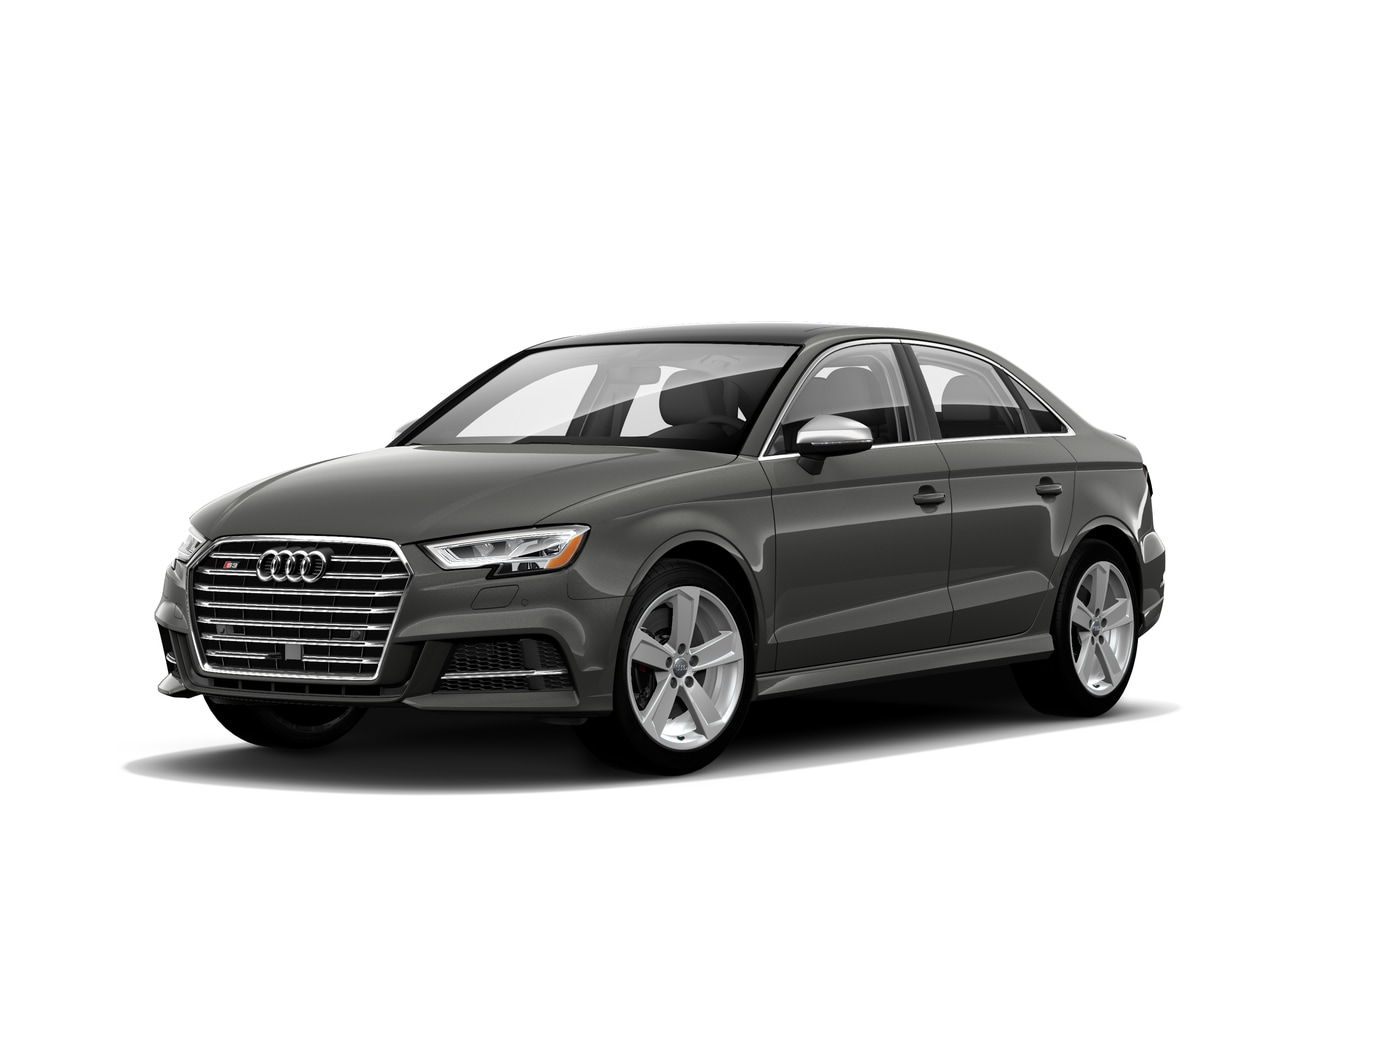 New 2018 Audi S3 For Sale Brookline Ma Vin